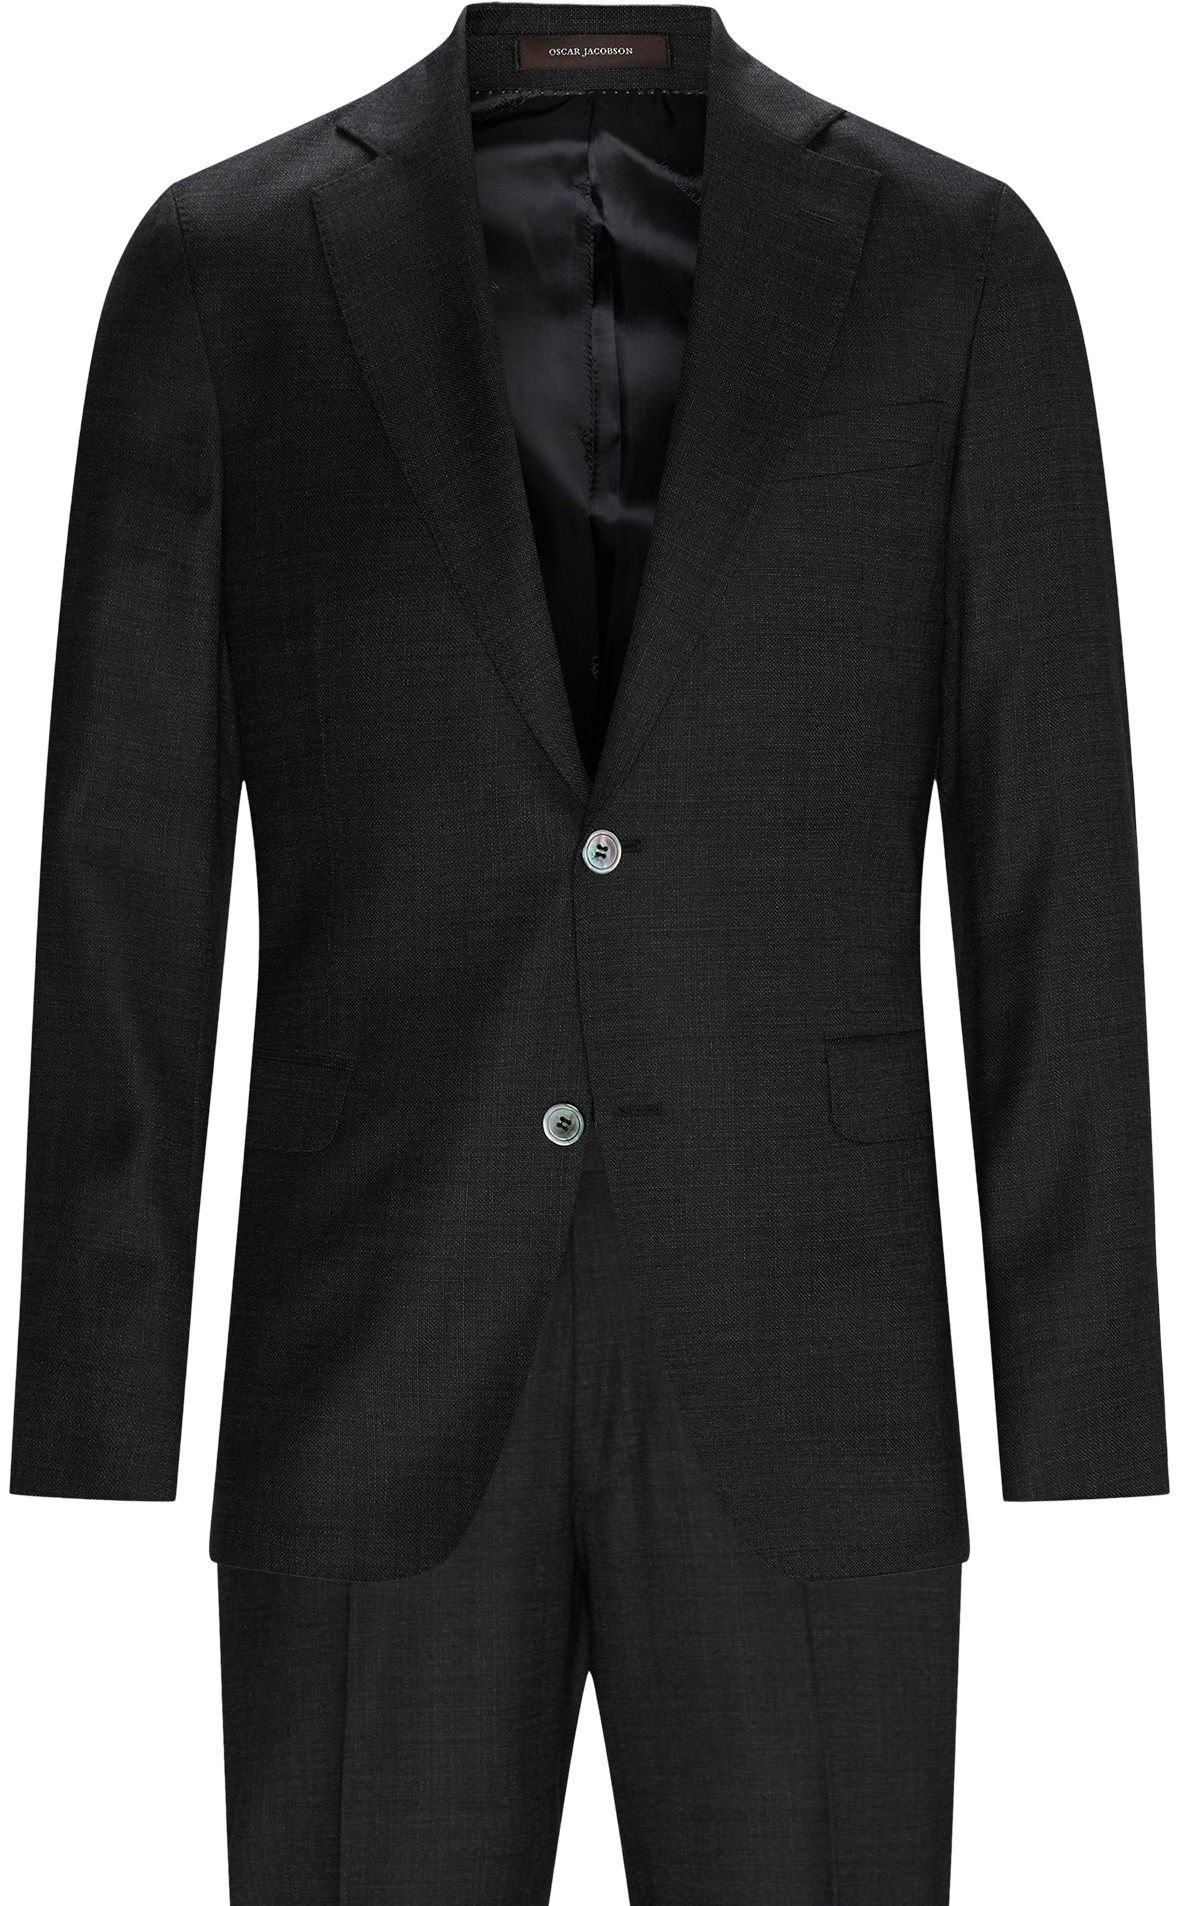 Suits - Regular fit - Grey